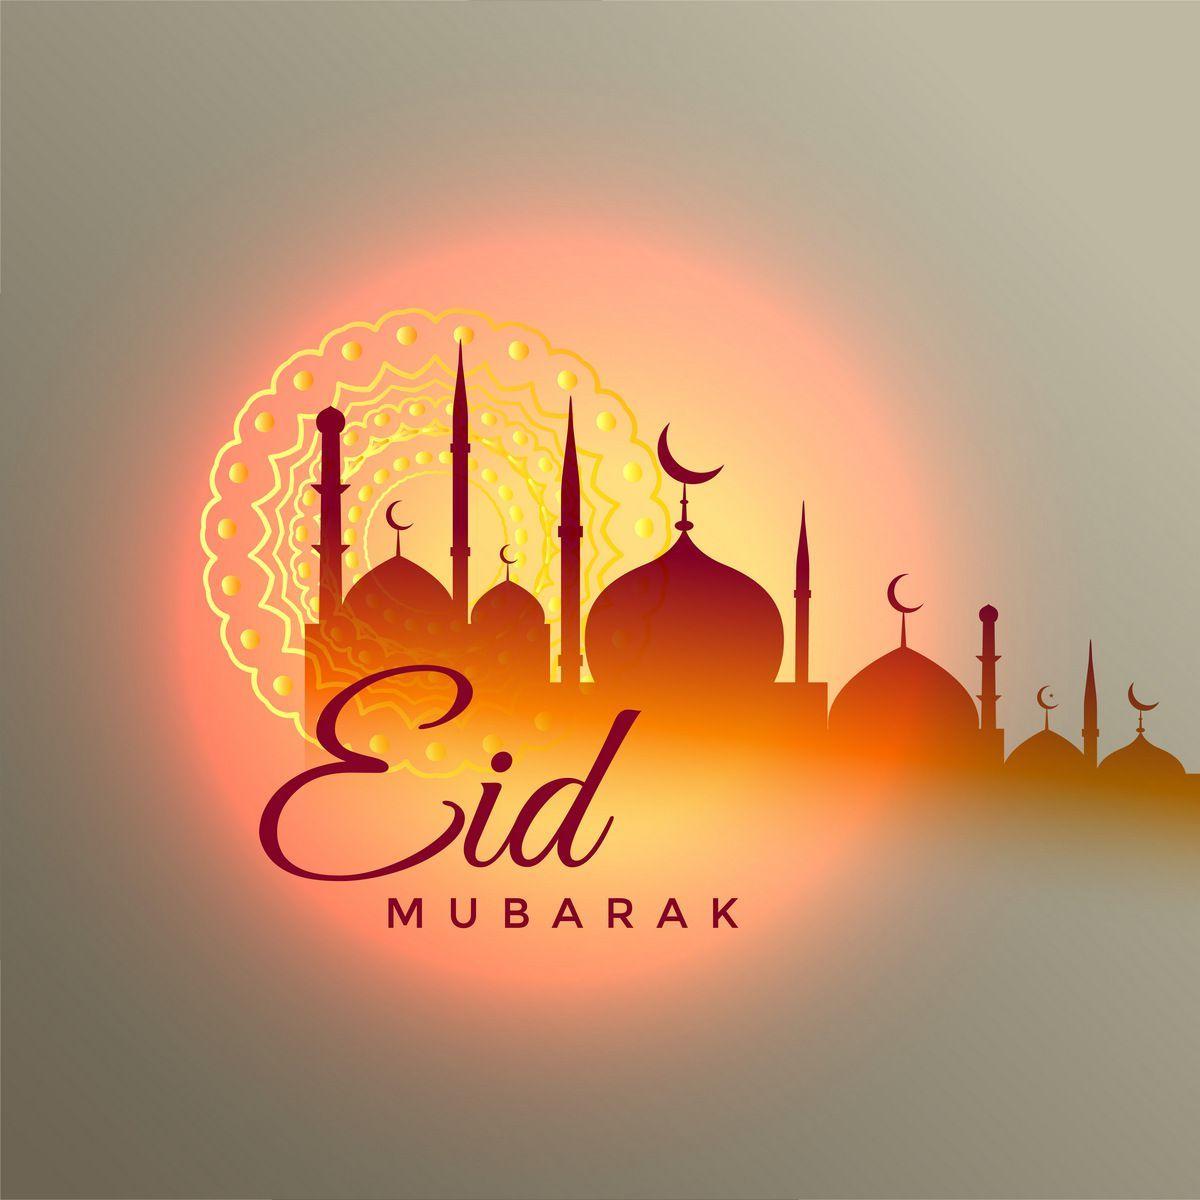 Eid Mubarak Beautiful Greeting Design Mosque Happy Eid Mubarak Eid Mubarak Greetings Eid Mubarak Wishes Images